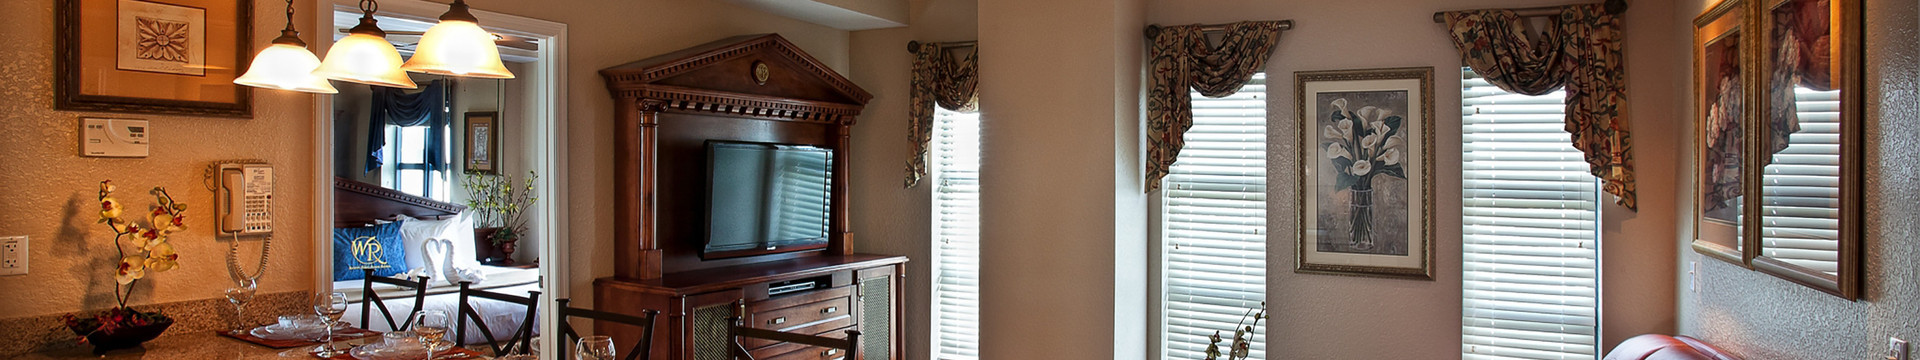 Accommodations in Orlando Florida | Resorts Near International Drive Orlando, FL | Westgate Palace Resort Near 32819